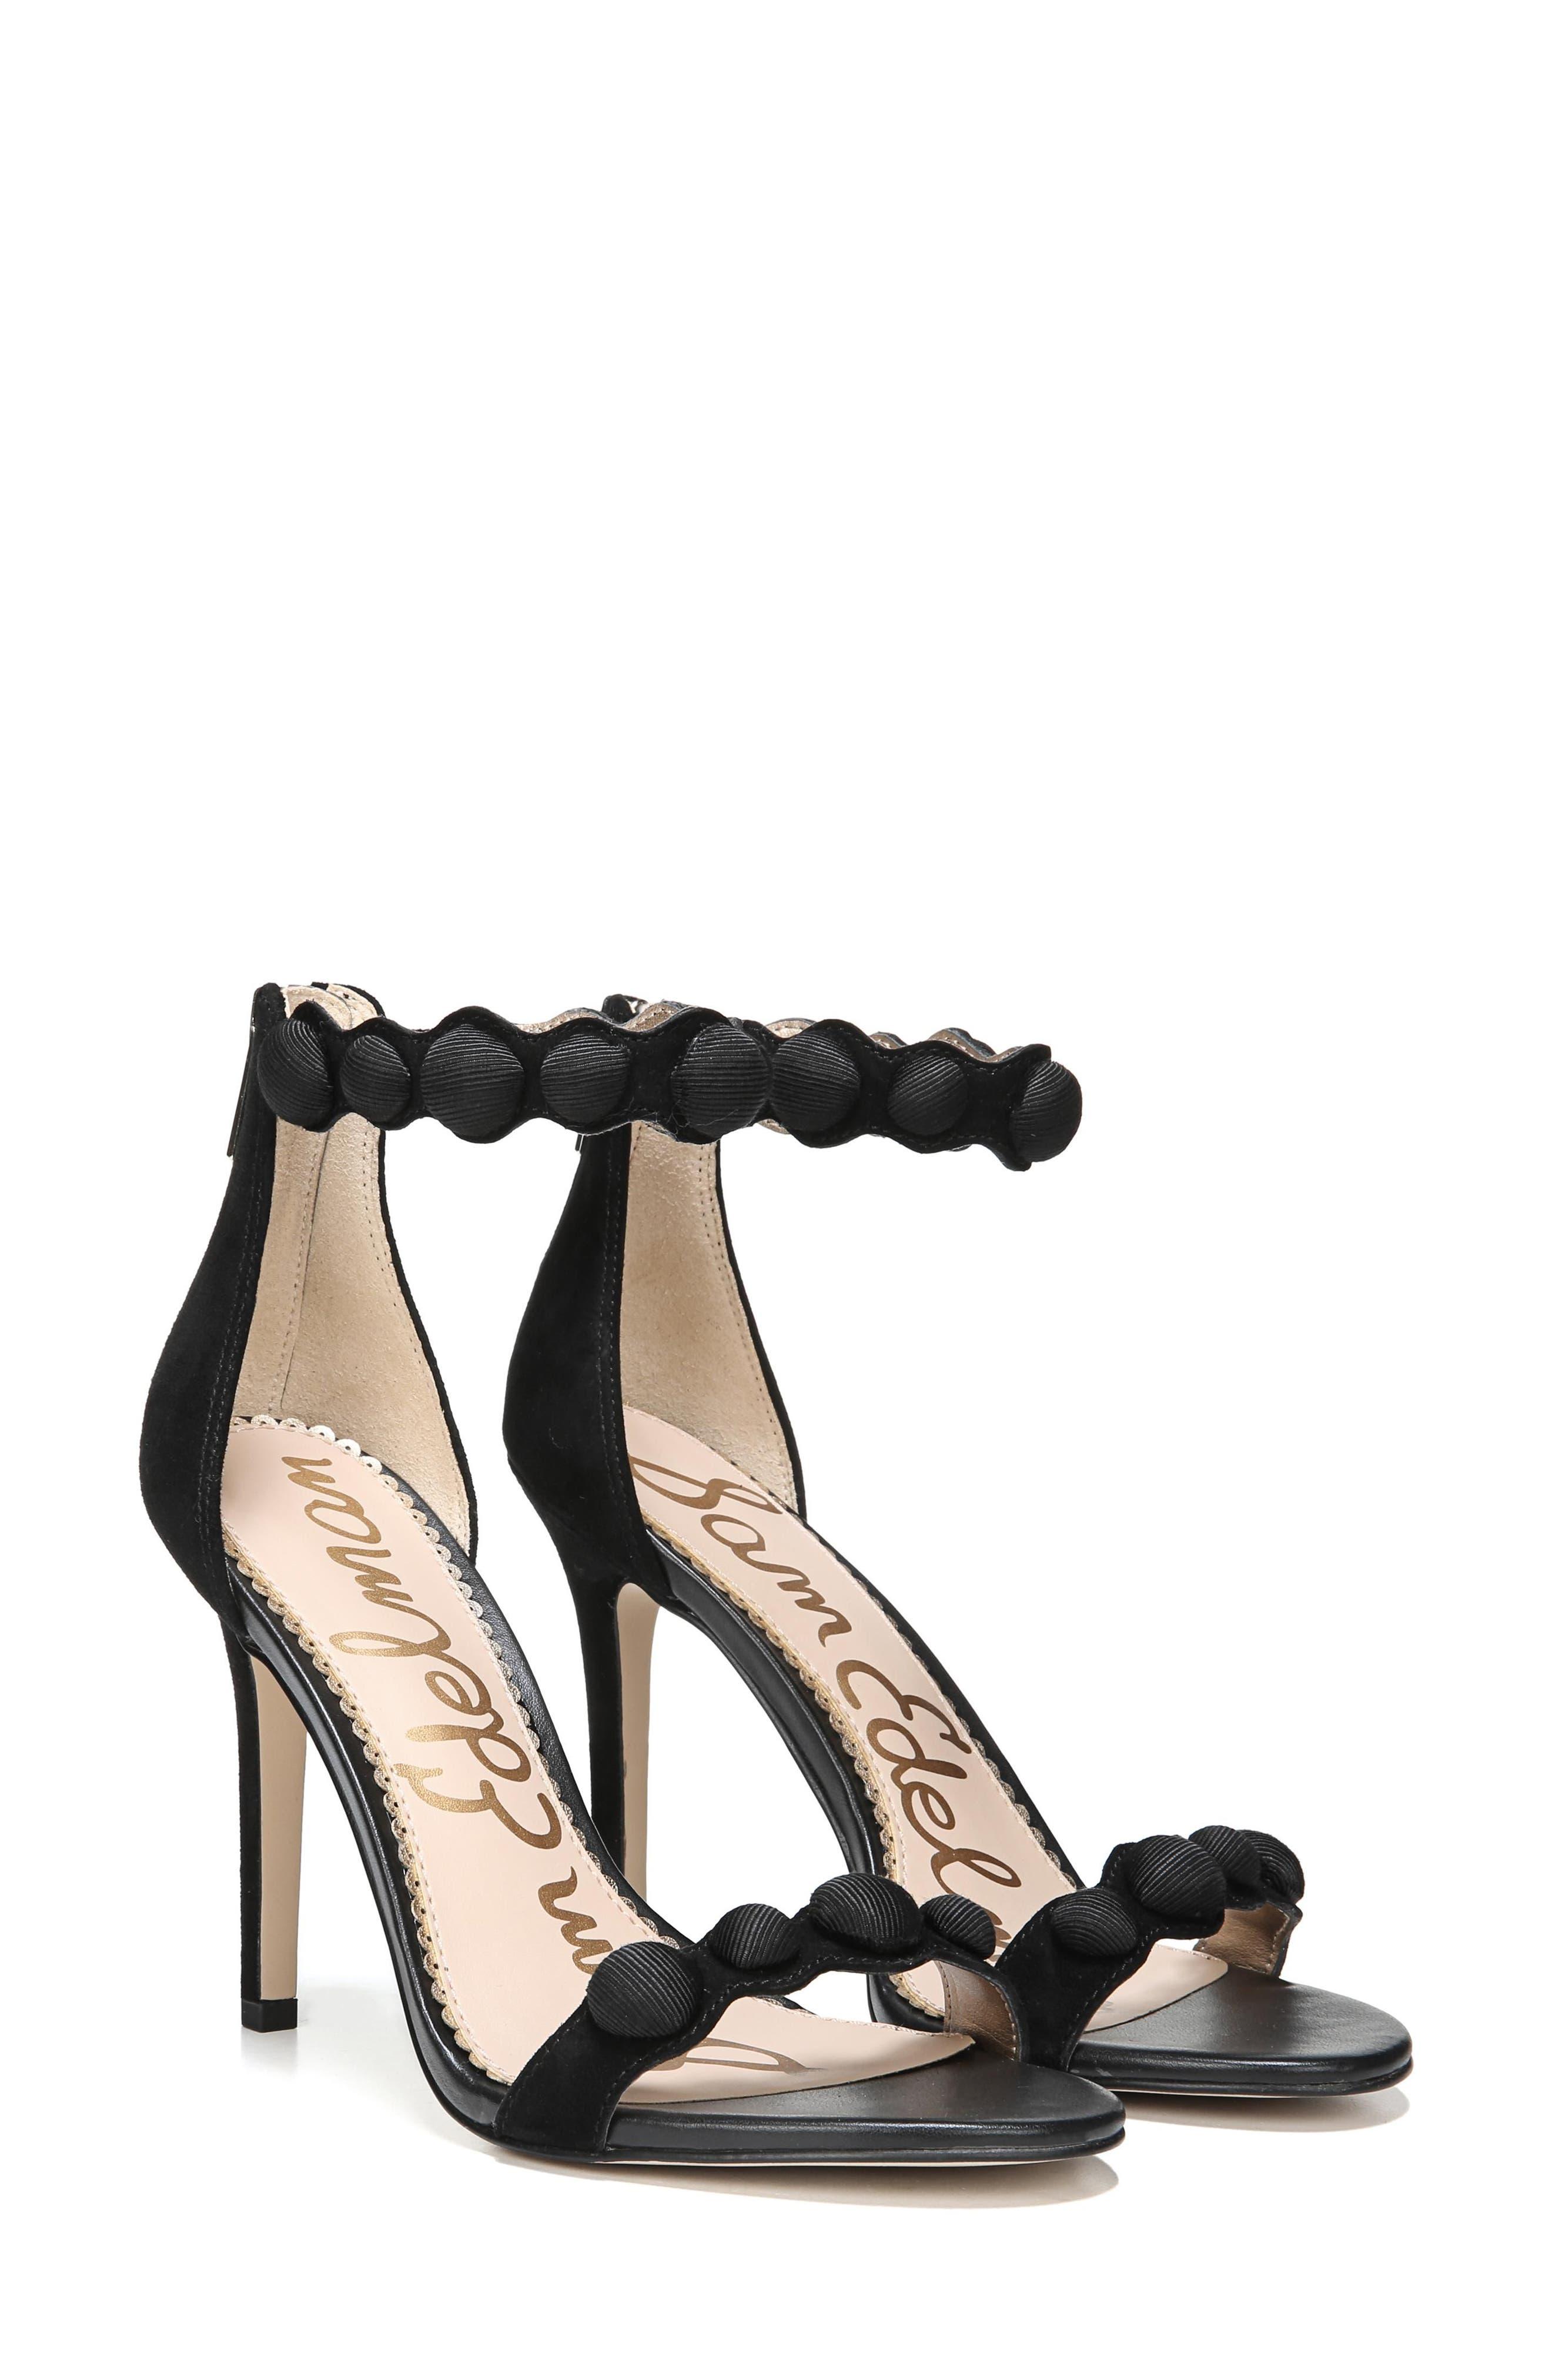 Sam Edelmen Addison Embellished Ankle Strap Sandal,                             Alternate thumbnail 8, color,                             001